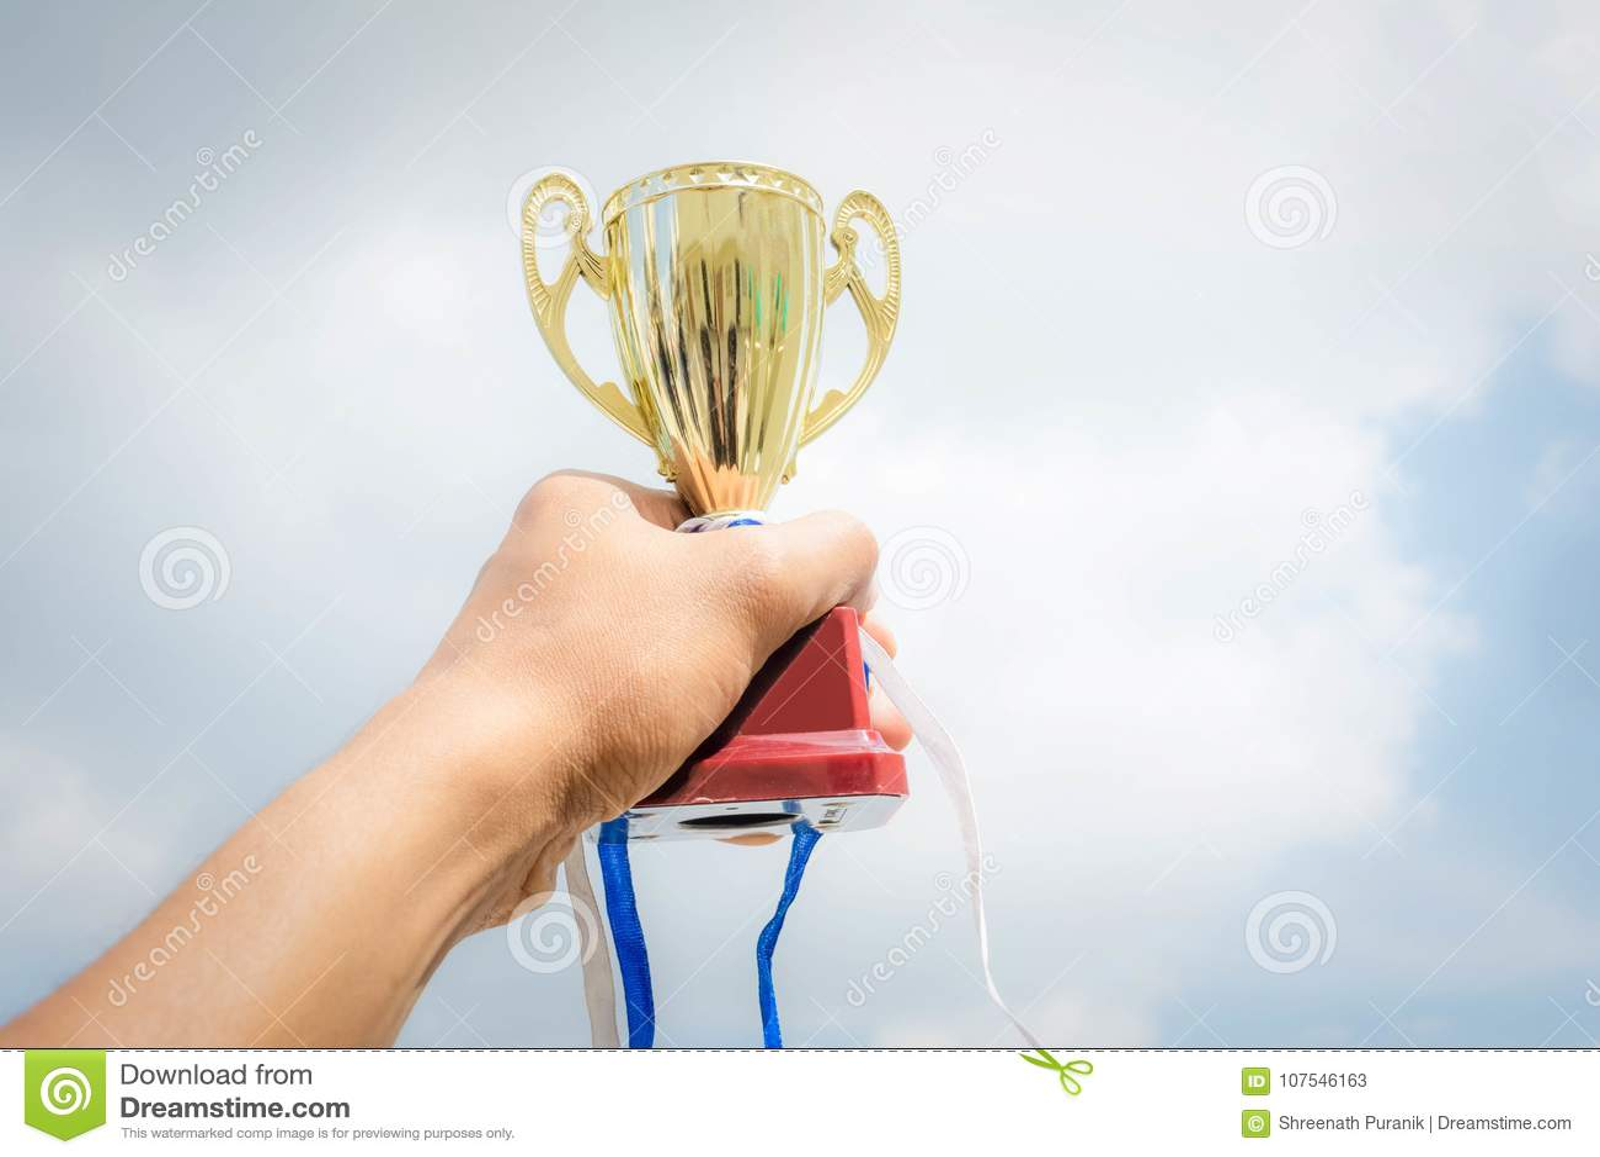 Winner trophy cup on sky background